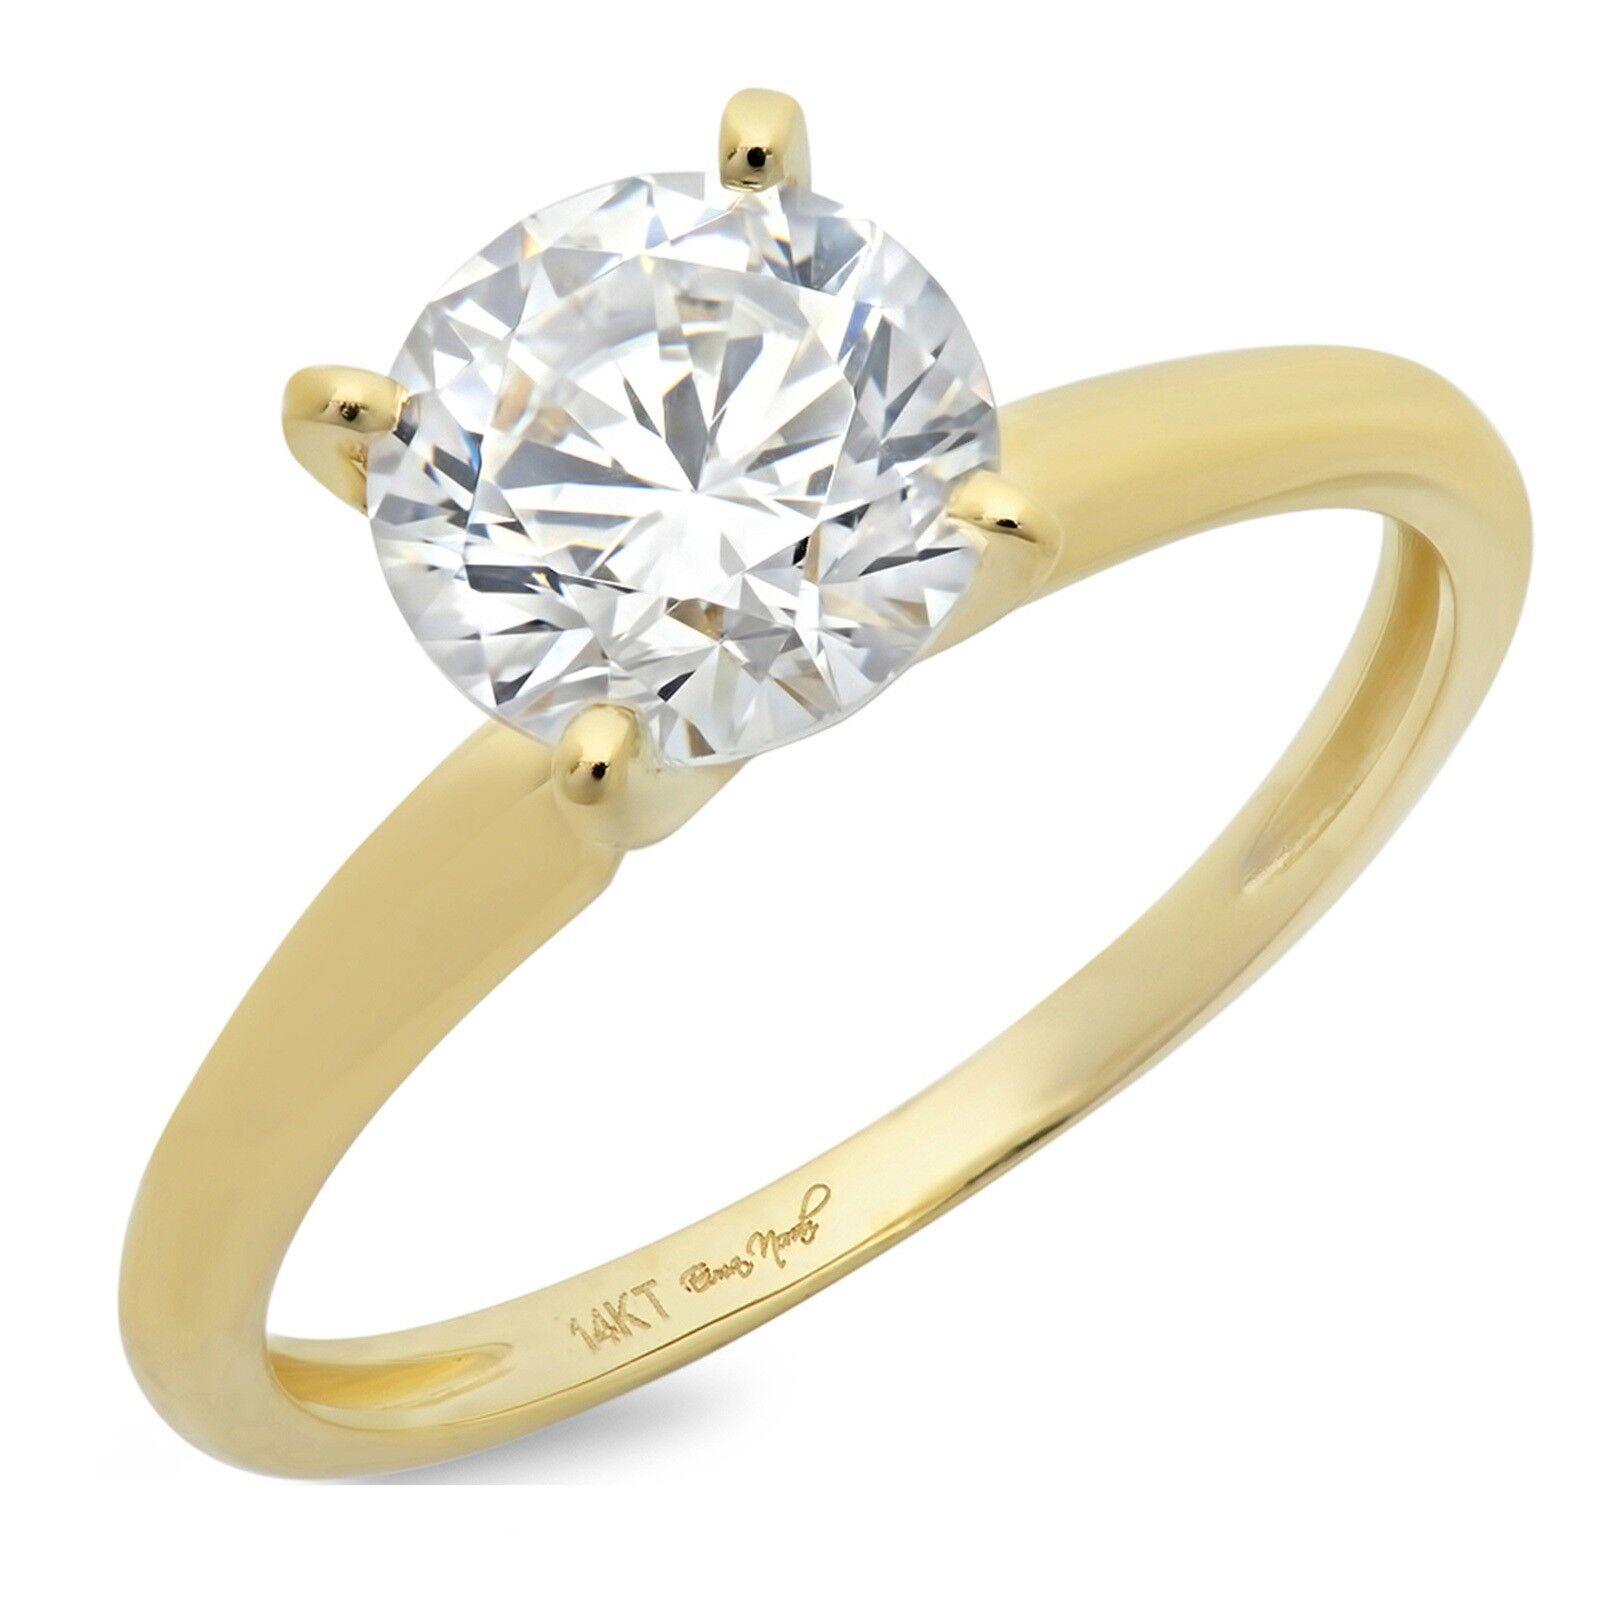 1.2ct Round Cut Wedding Bridal Engagement Anniversary Ring 14k Yellow gold